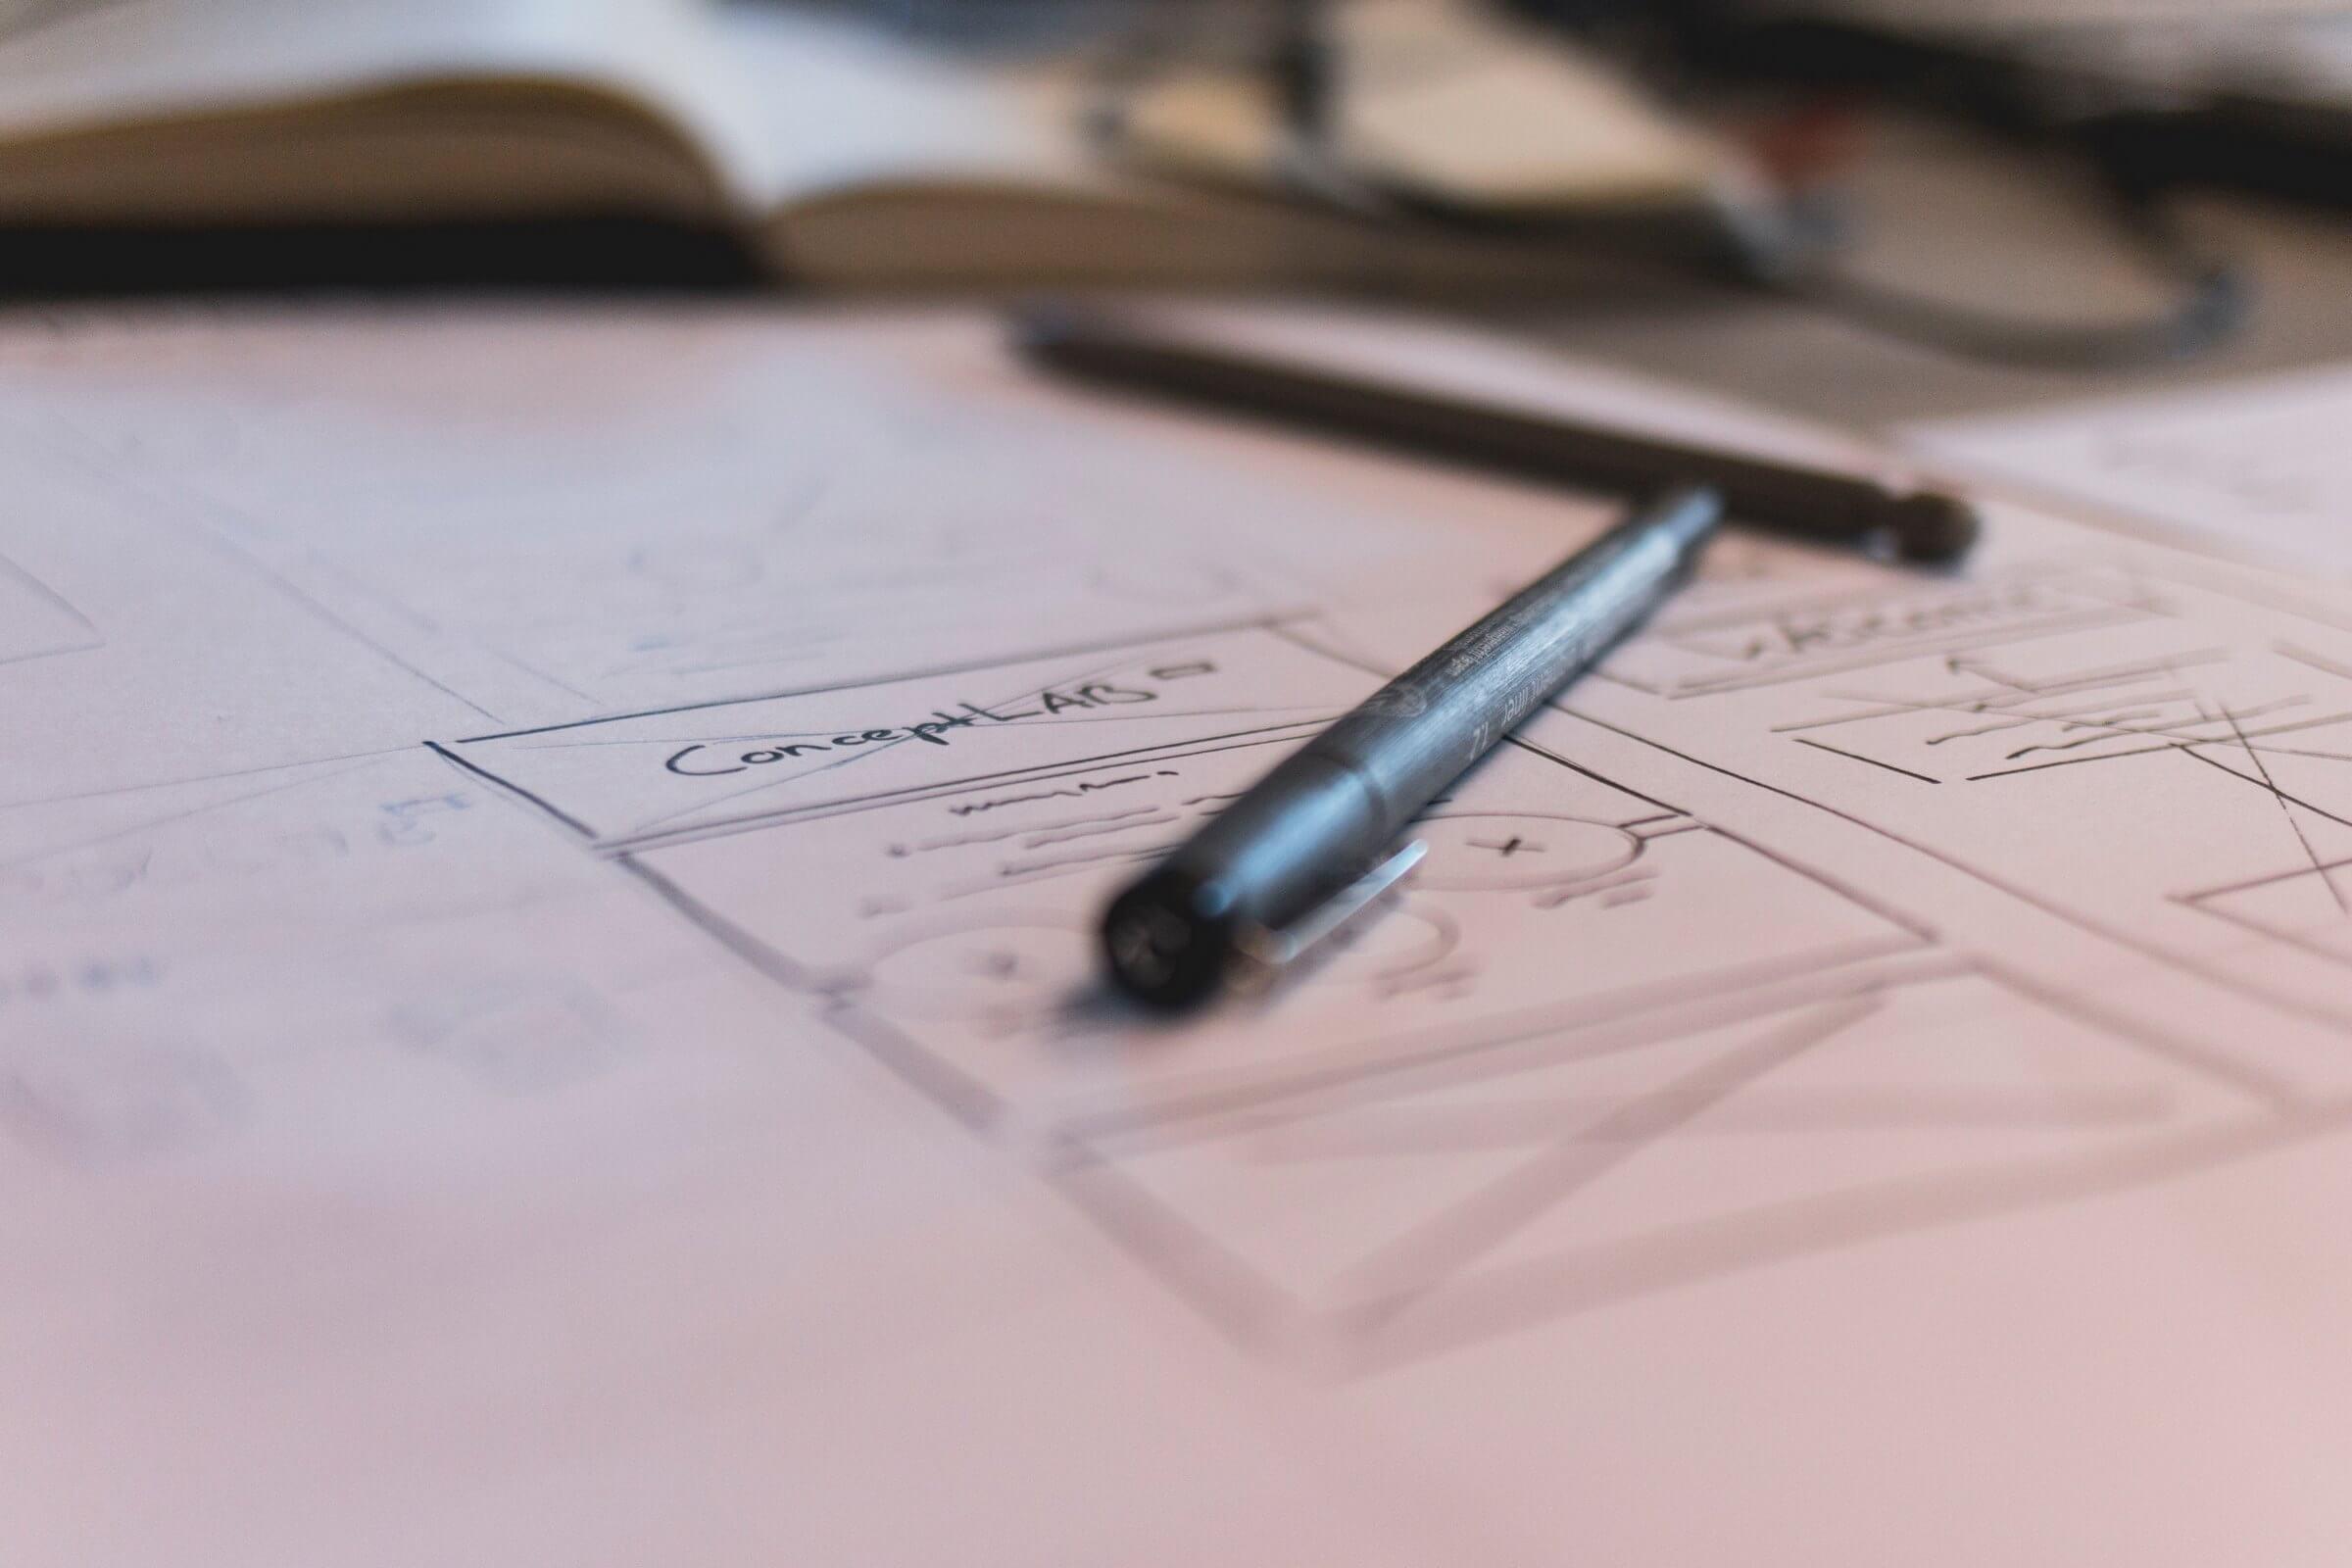 Napravite funkcionalni sajt - strategija